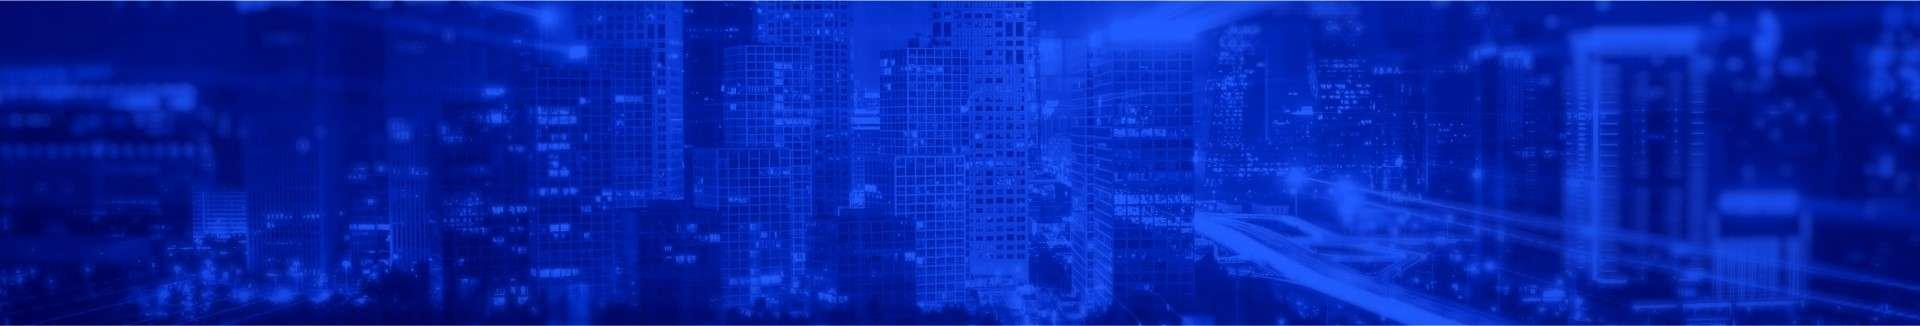 política de privacidade fundo cidade azul